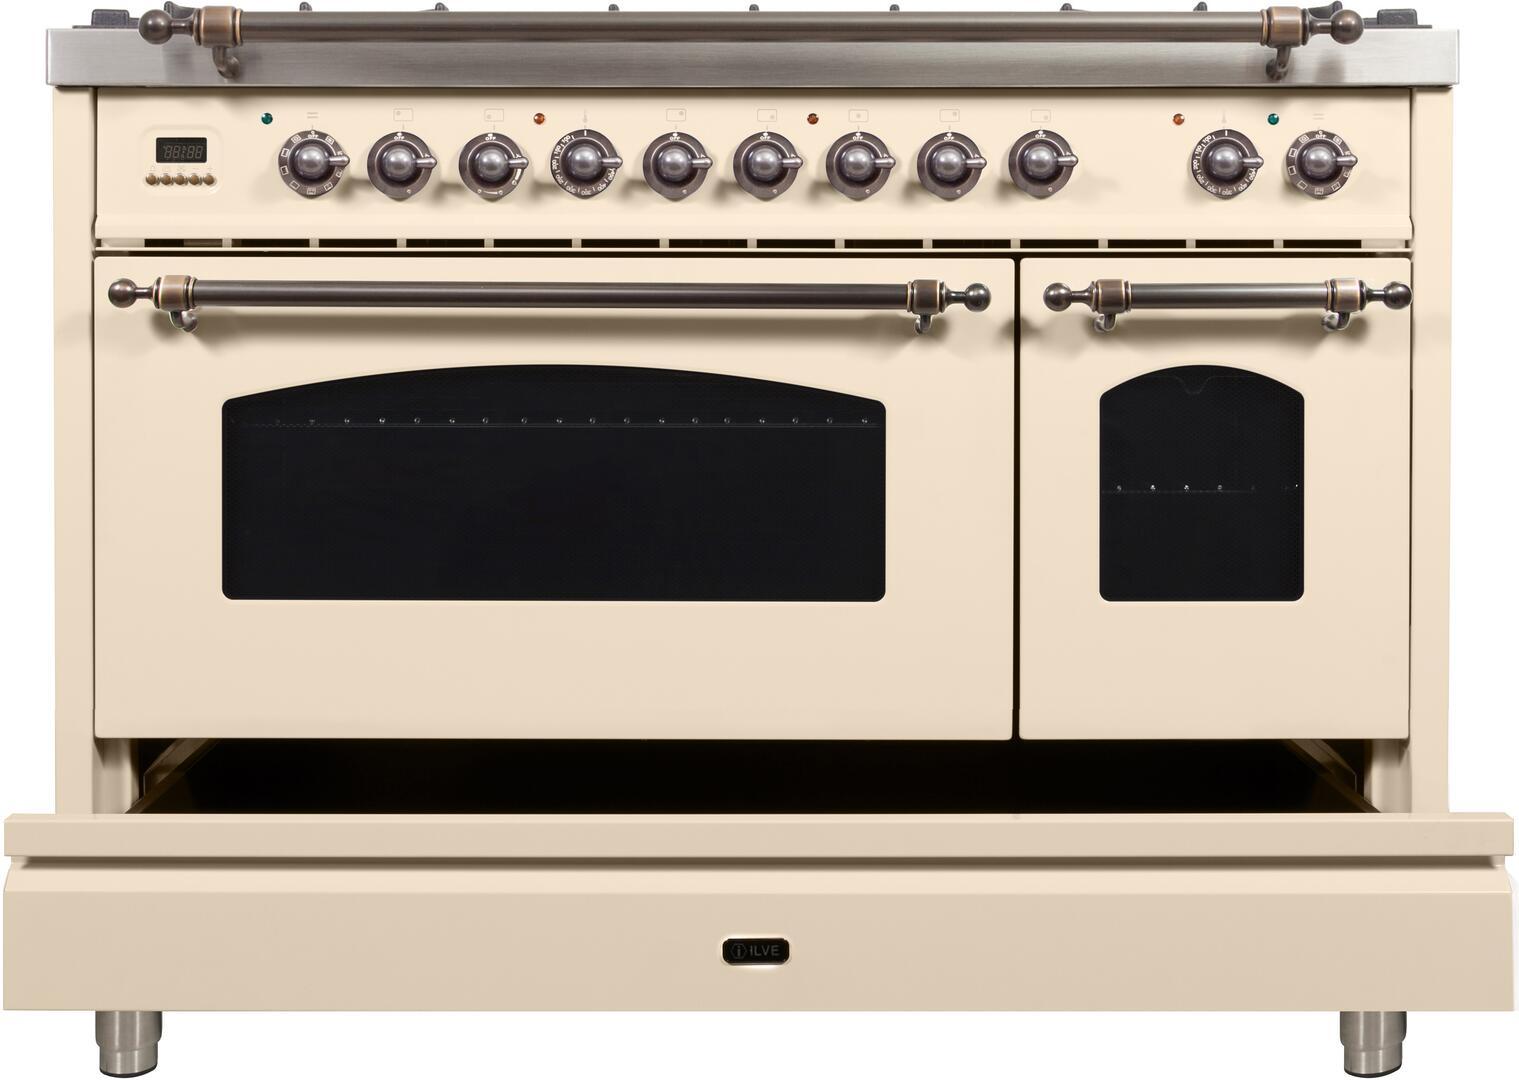 Ilve Nostalgie UPN120FDMPAY Freestanding Dual Fuel Range Bisque, ilve UPN120FDMPAY range open storage